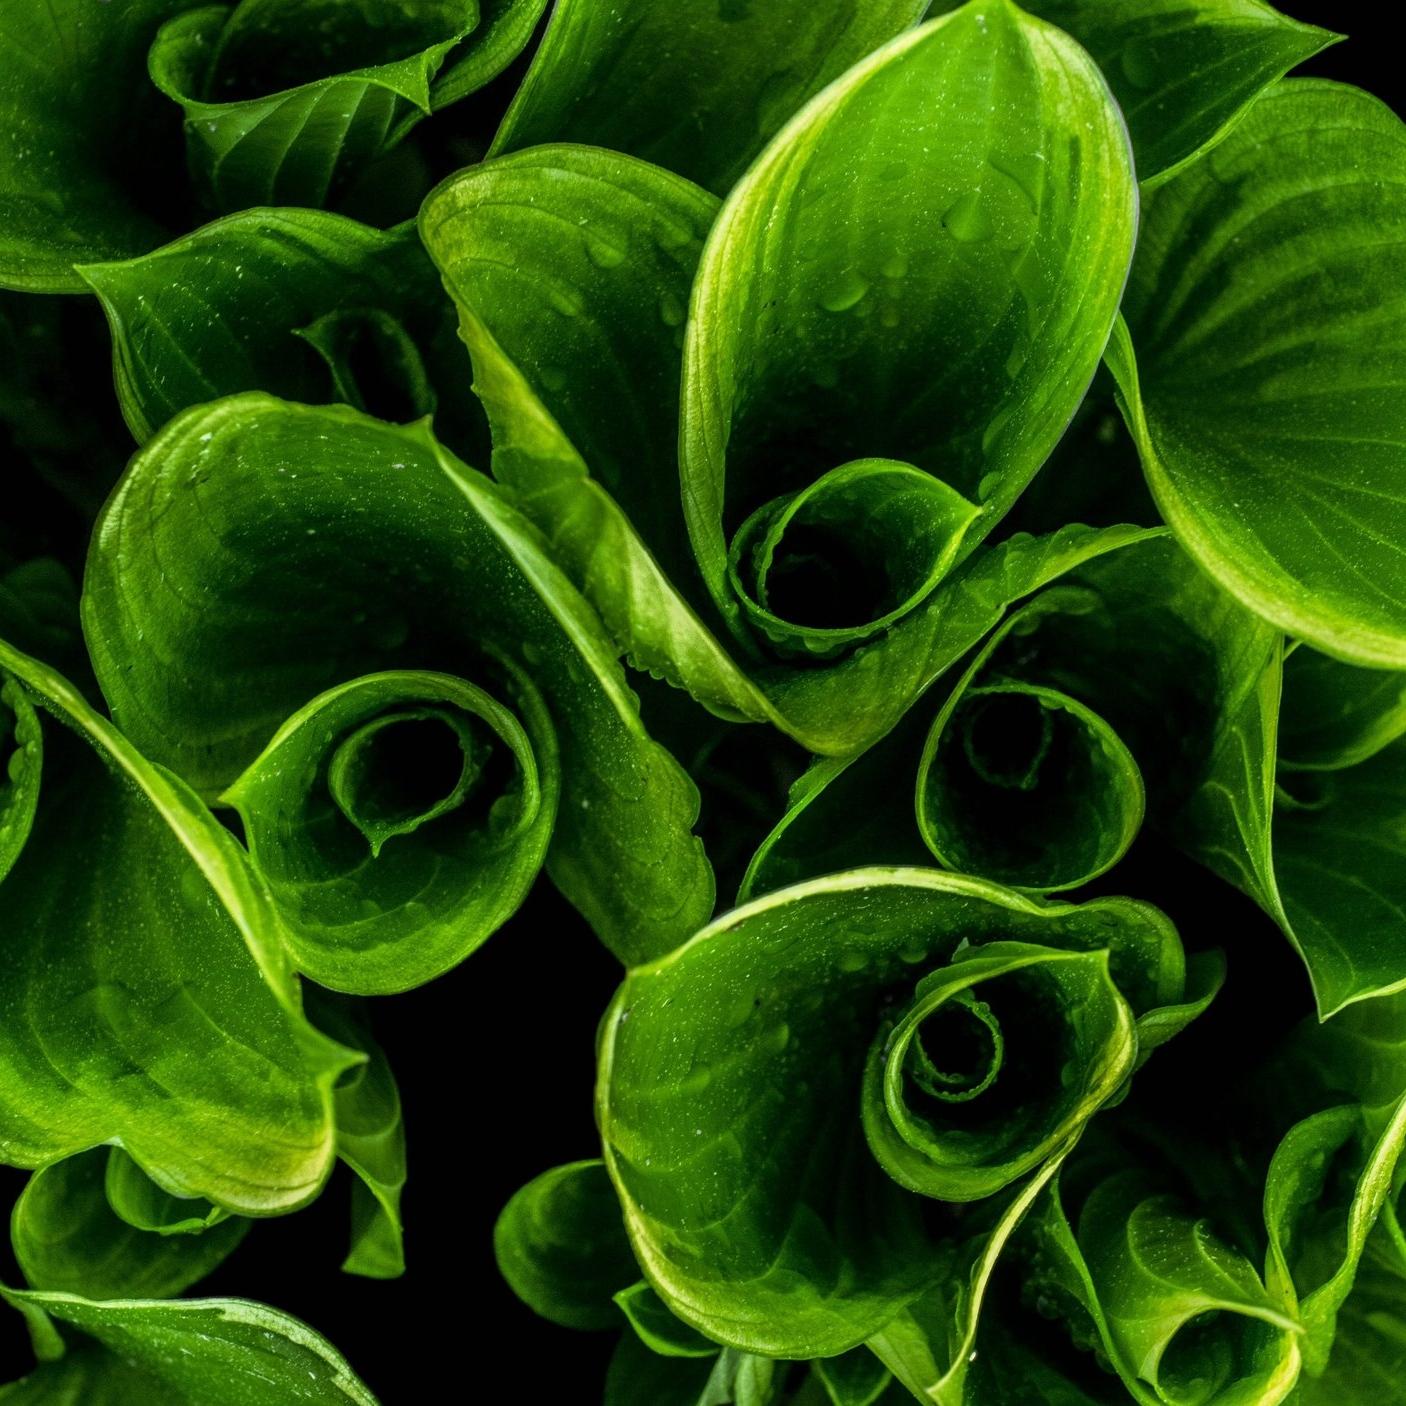 close-up-green-leaves-119591.jpg